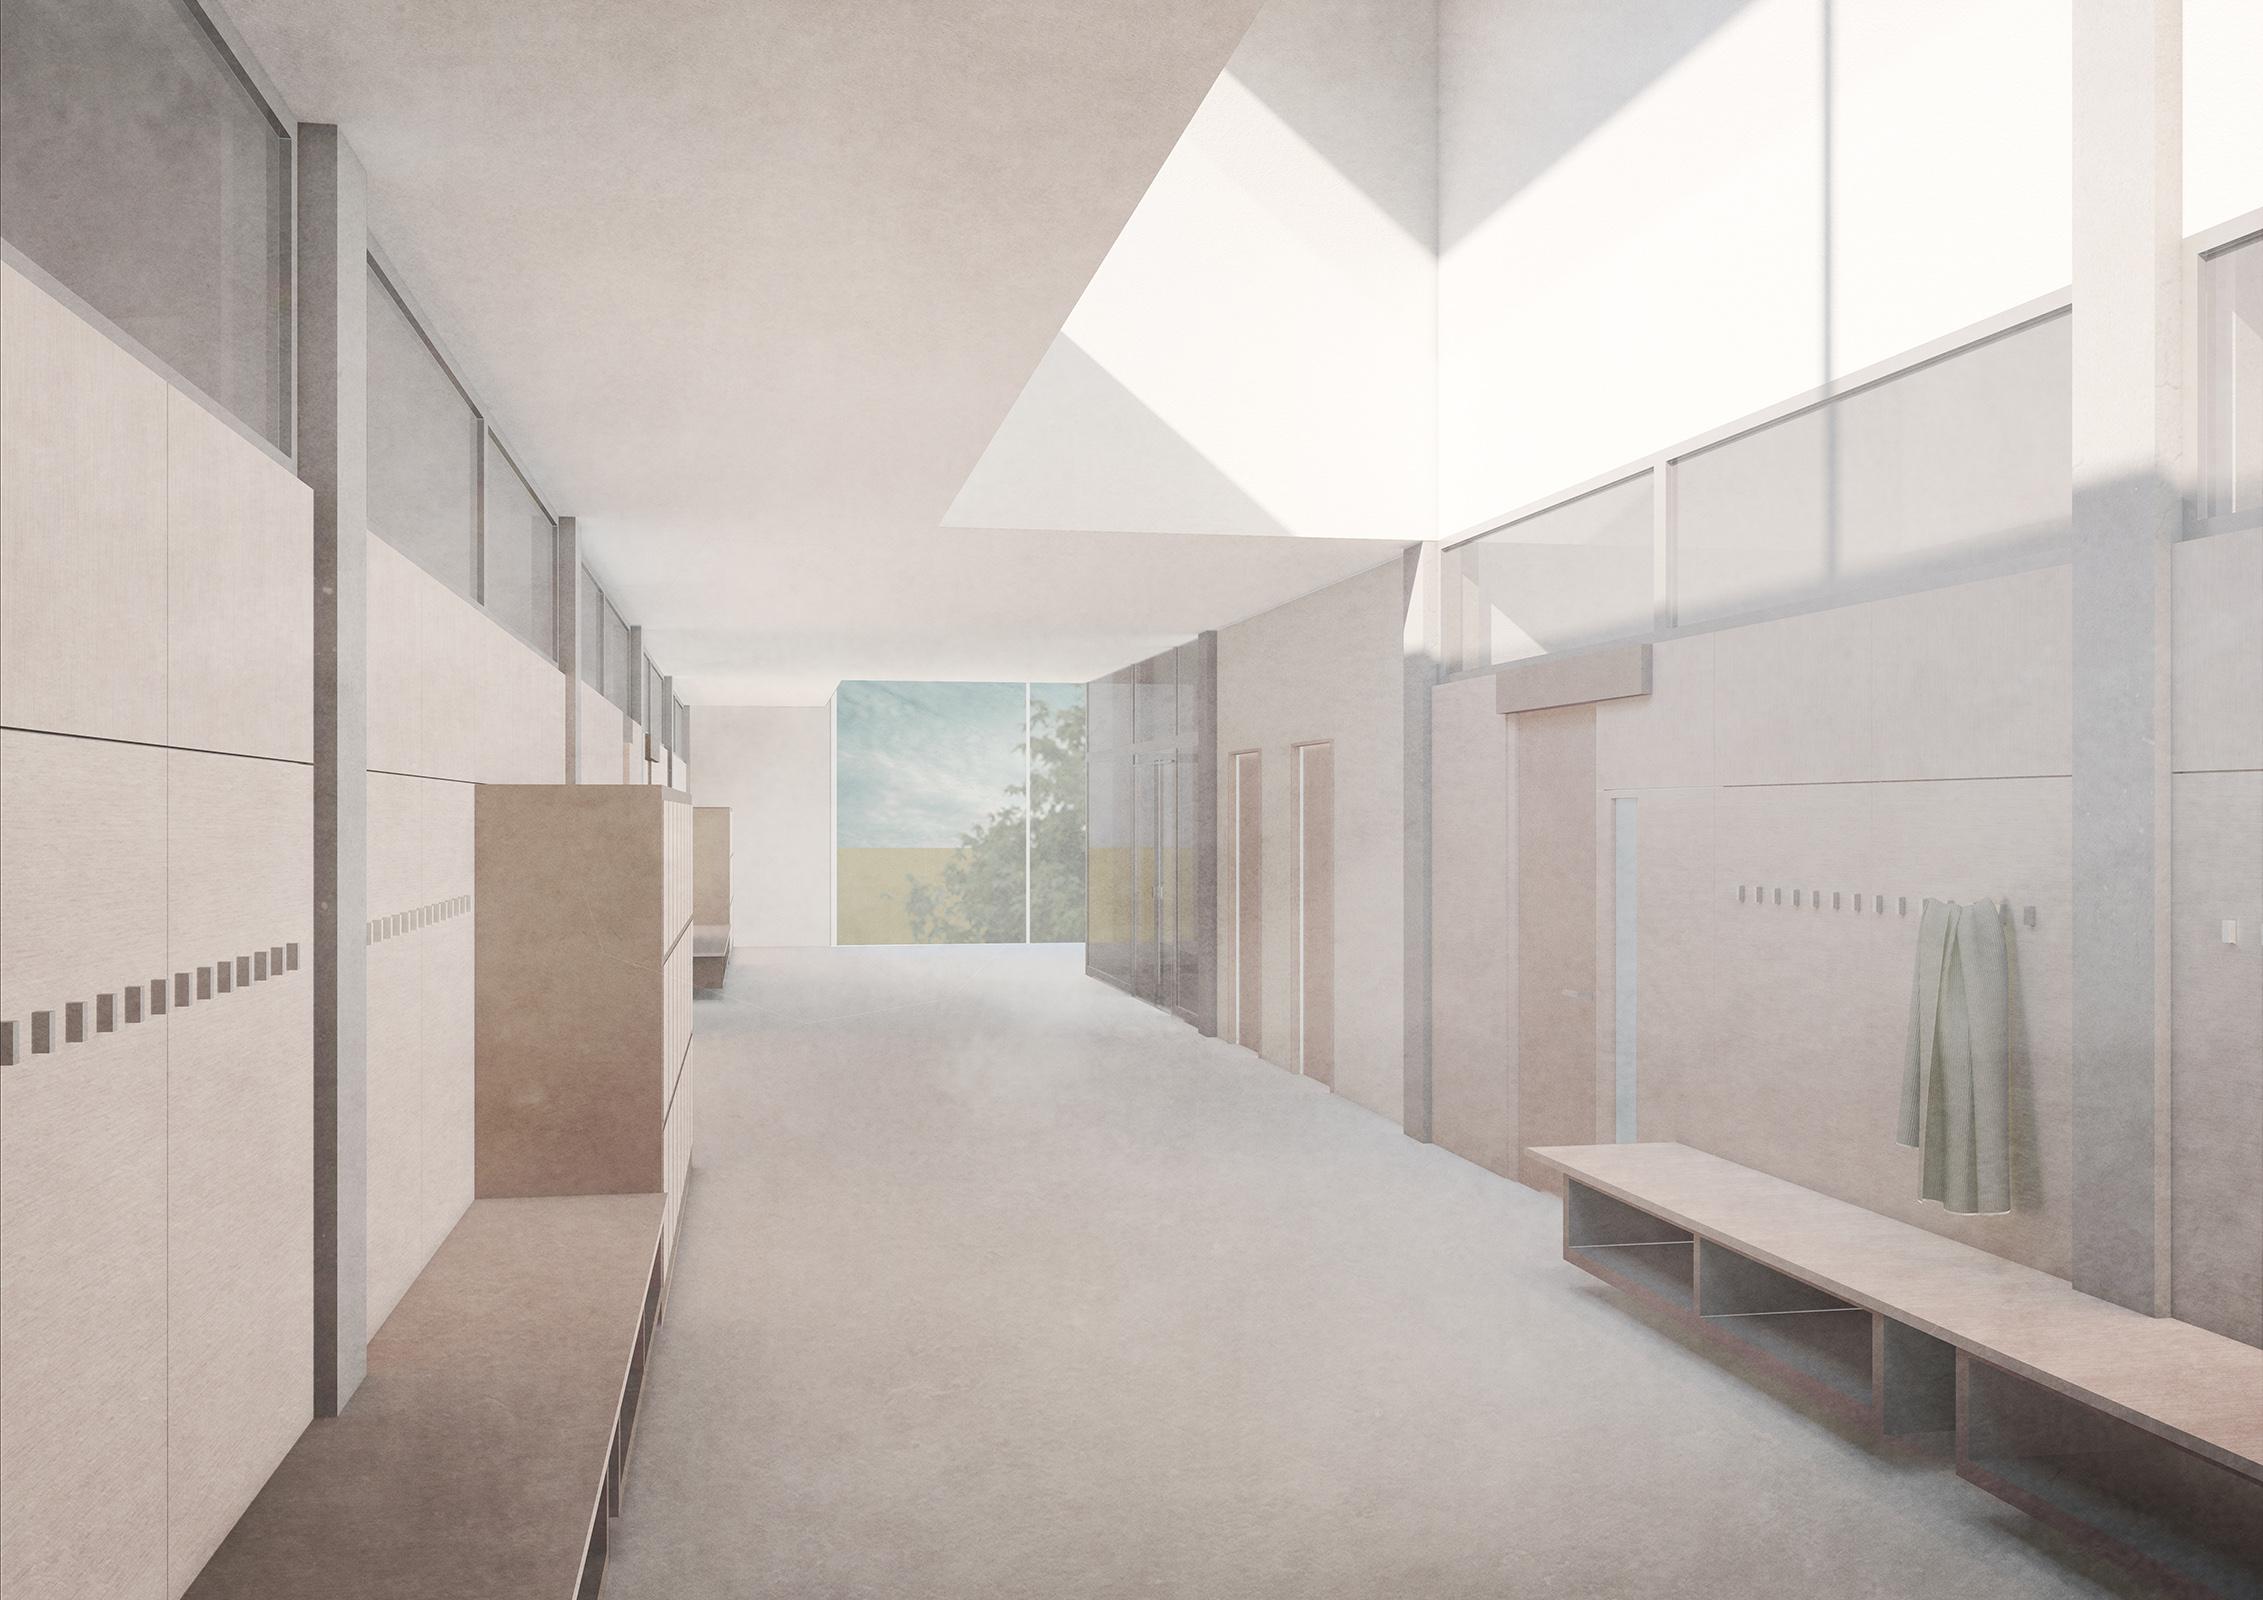 295Sekundarschulhaus Chliriet Oberglatt